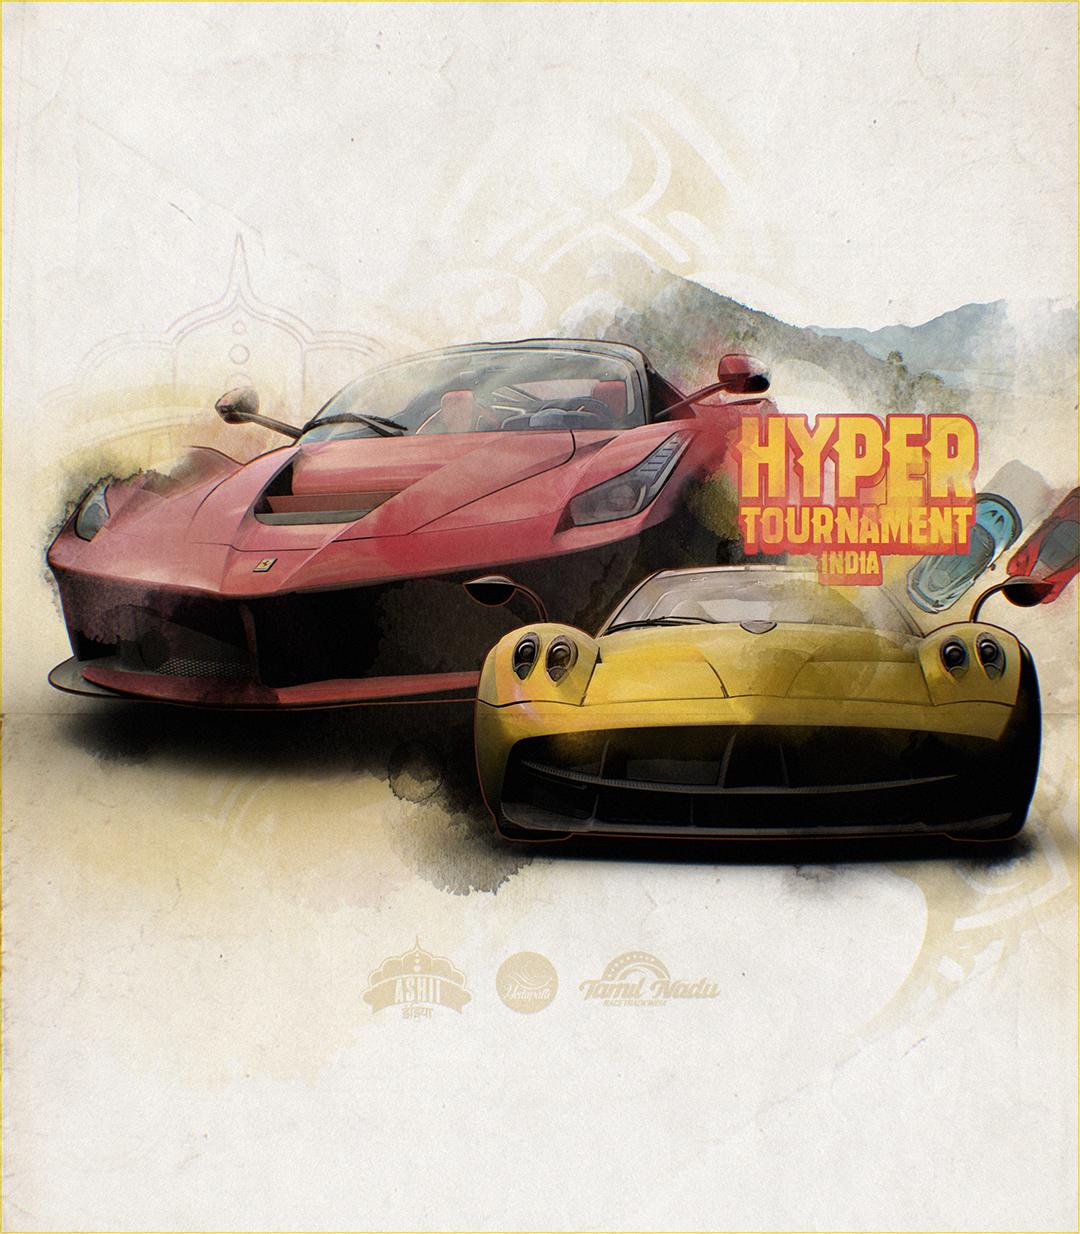 30_hyper_tournament_india copy.jpg